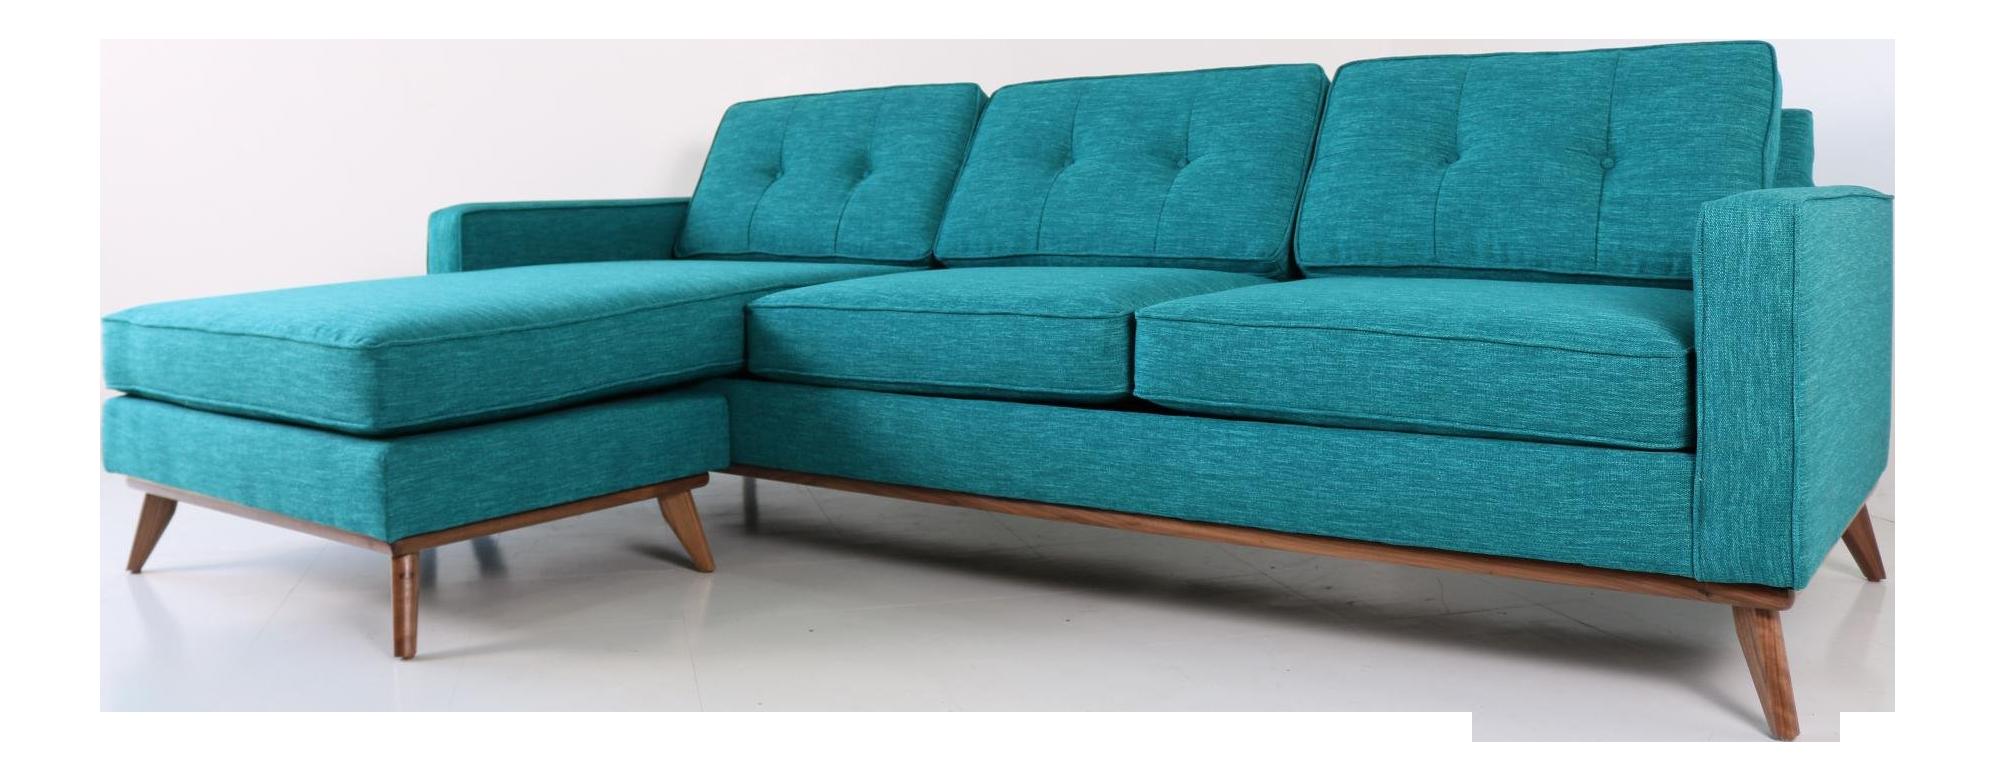 Mid Century Modern Sofa Chaise Chairish